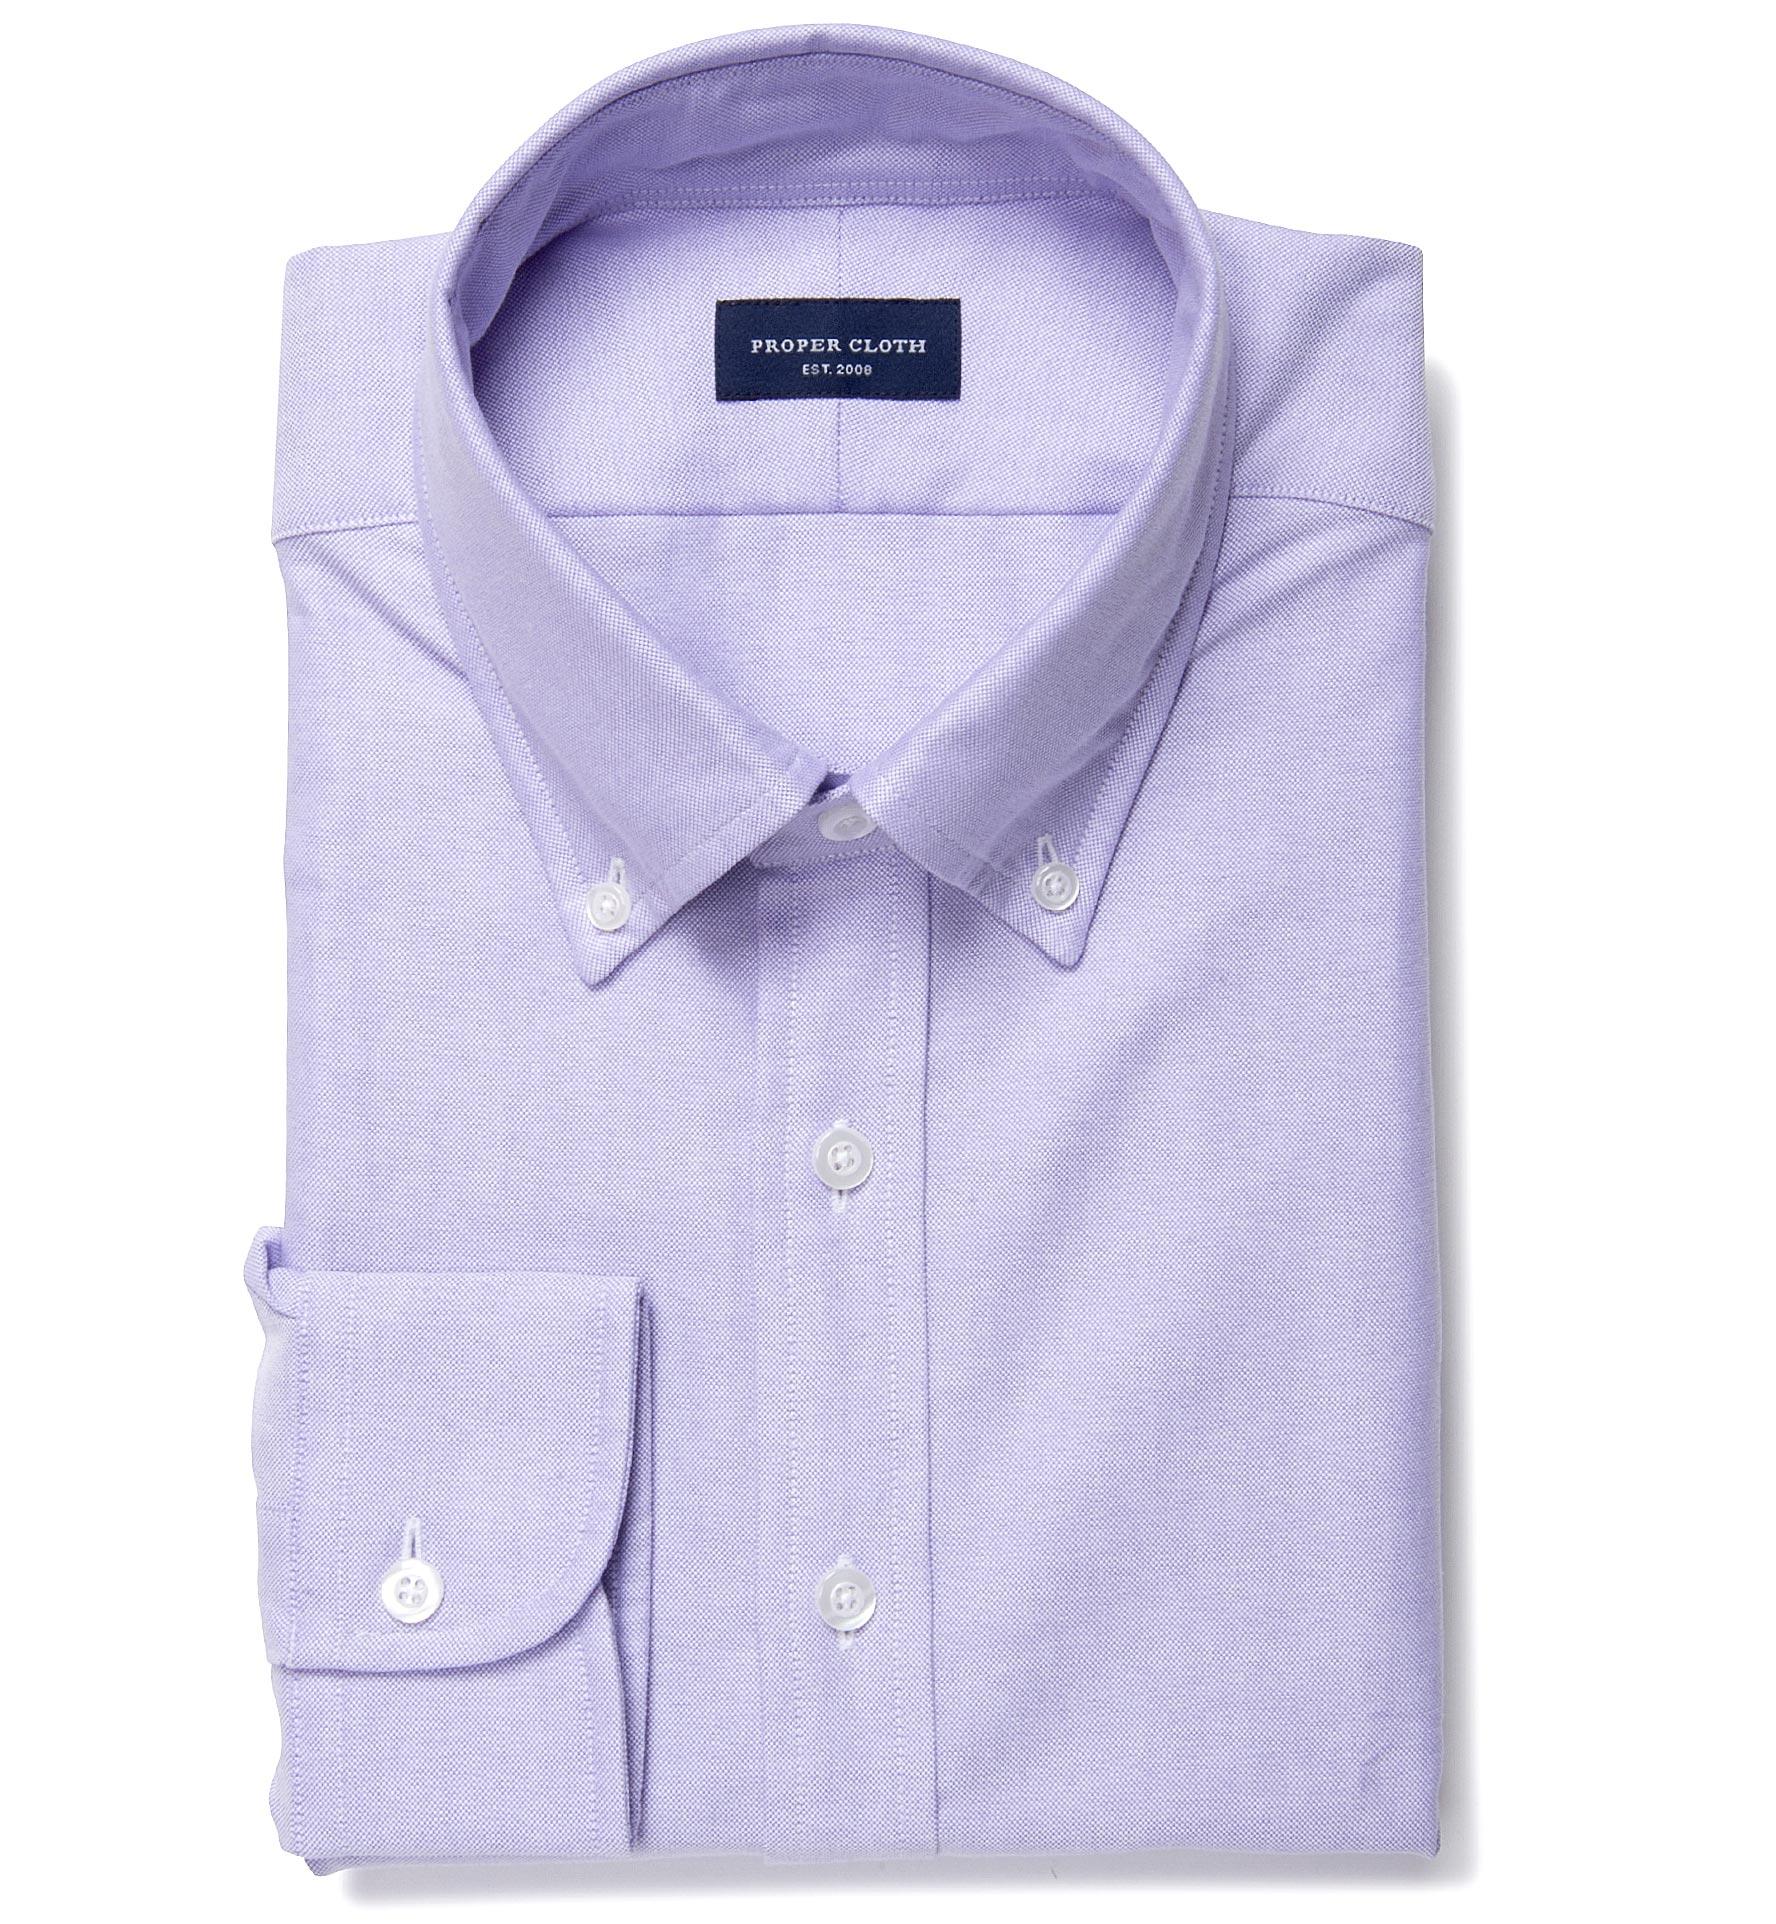 df22d75ce Lilac Heavy Oxford Men s Dress Shirt by Proper Cloth